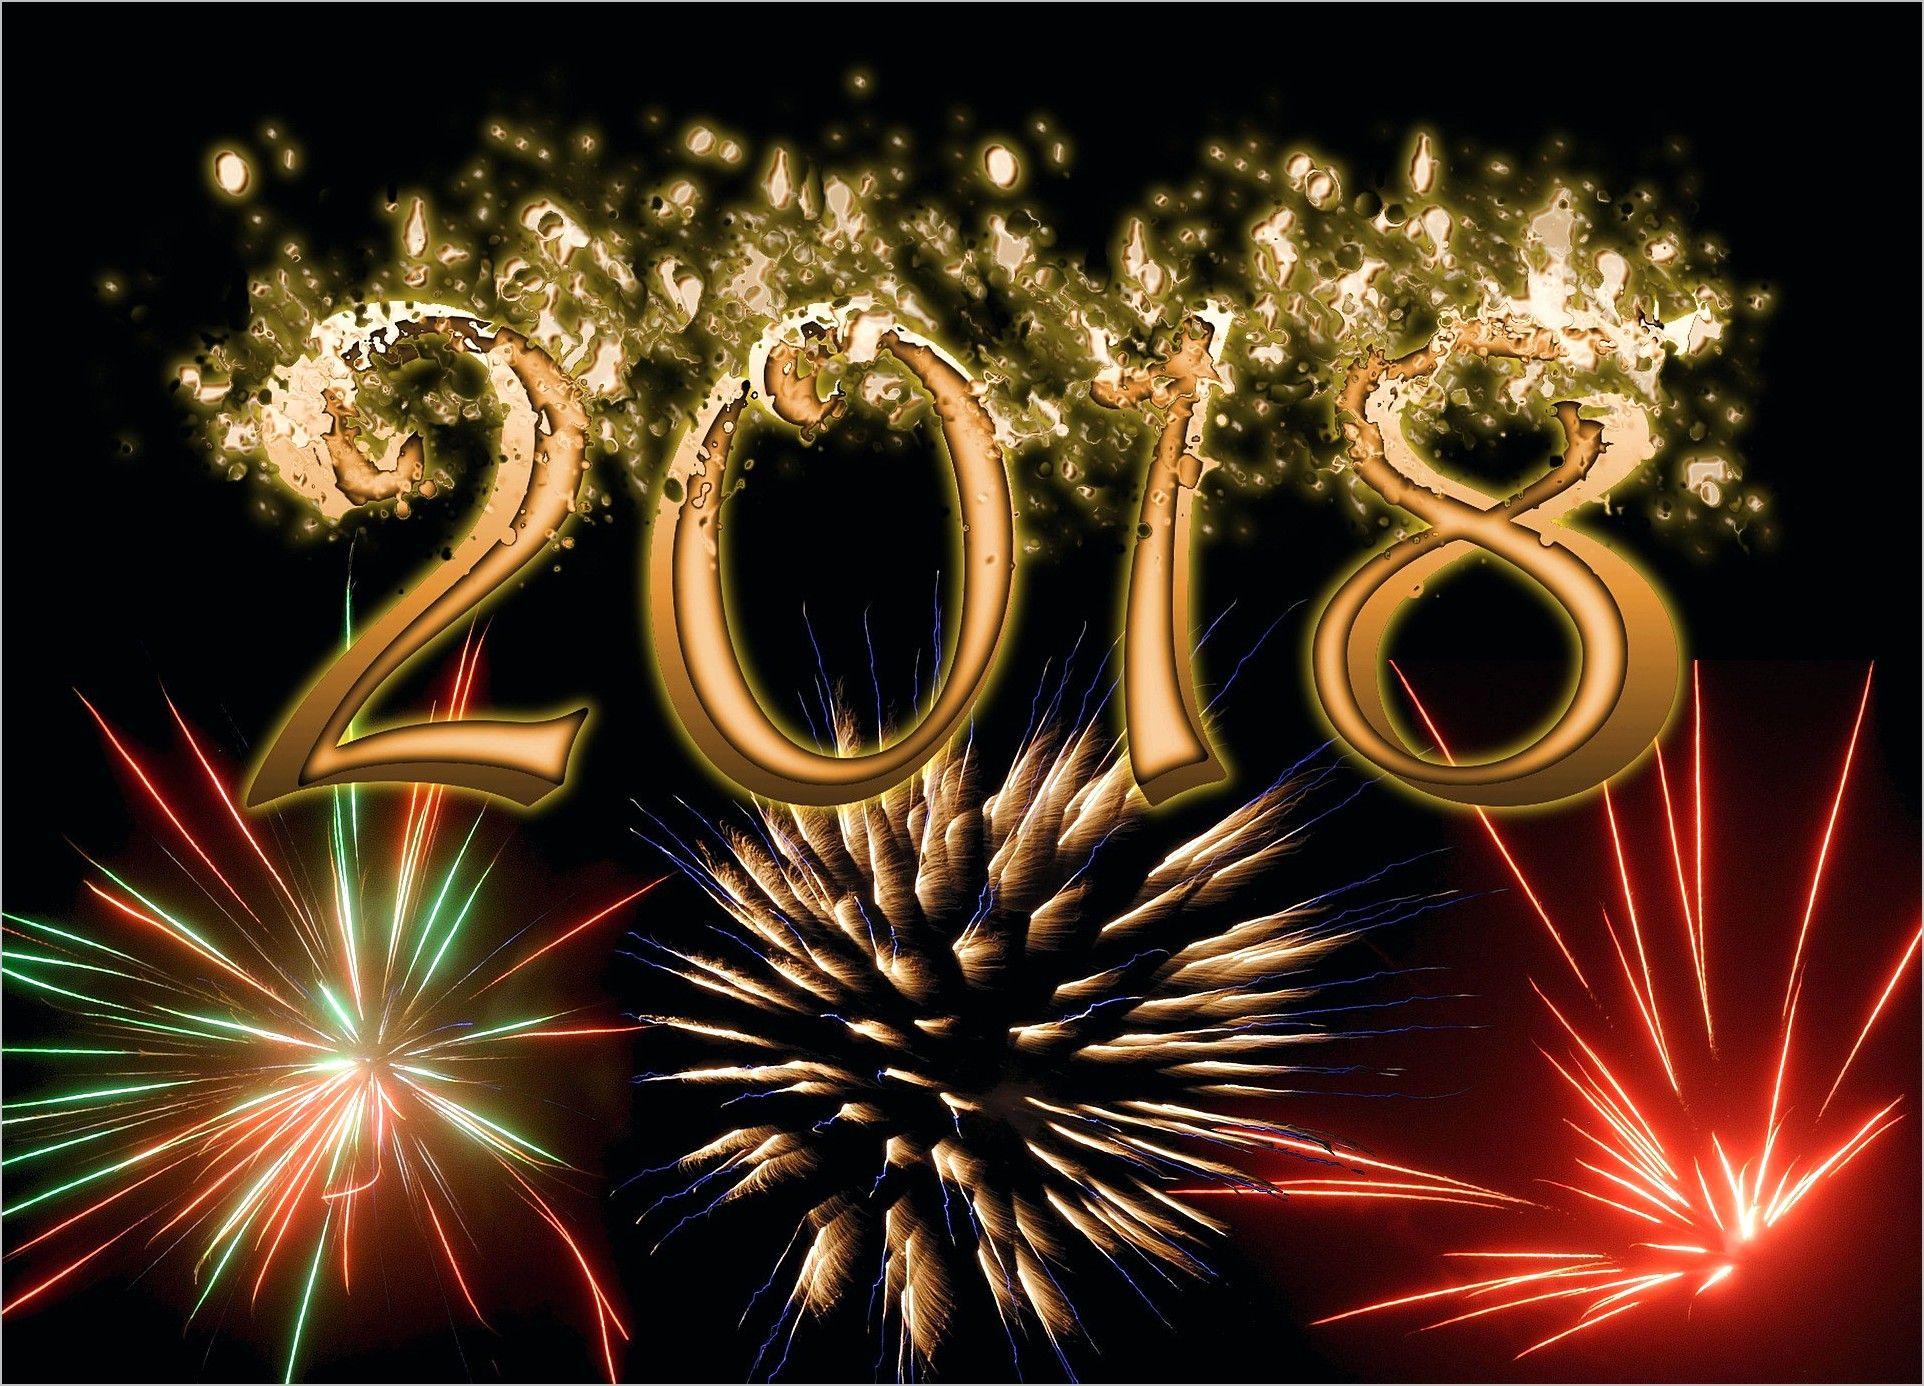 4k Wallpaper New Year 2018